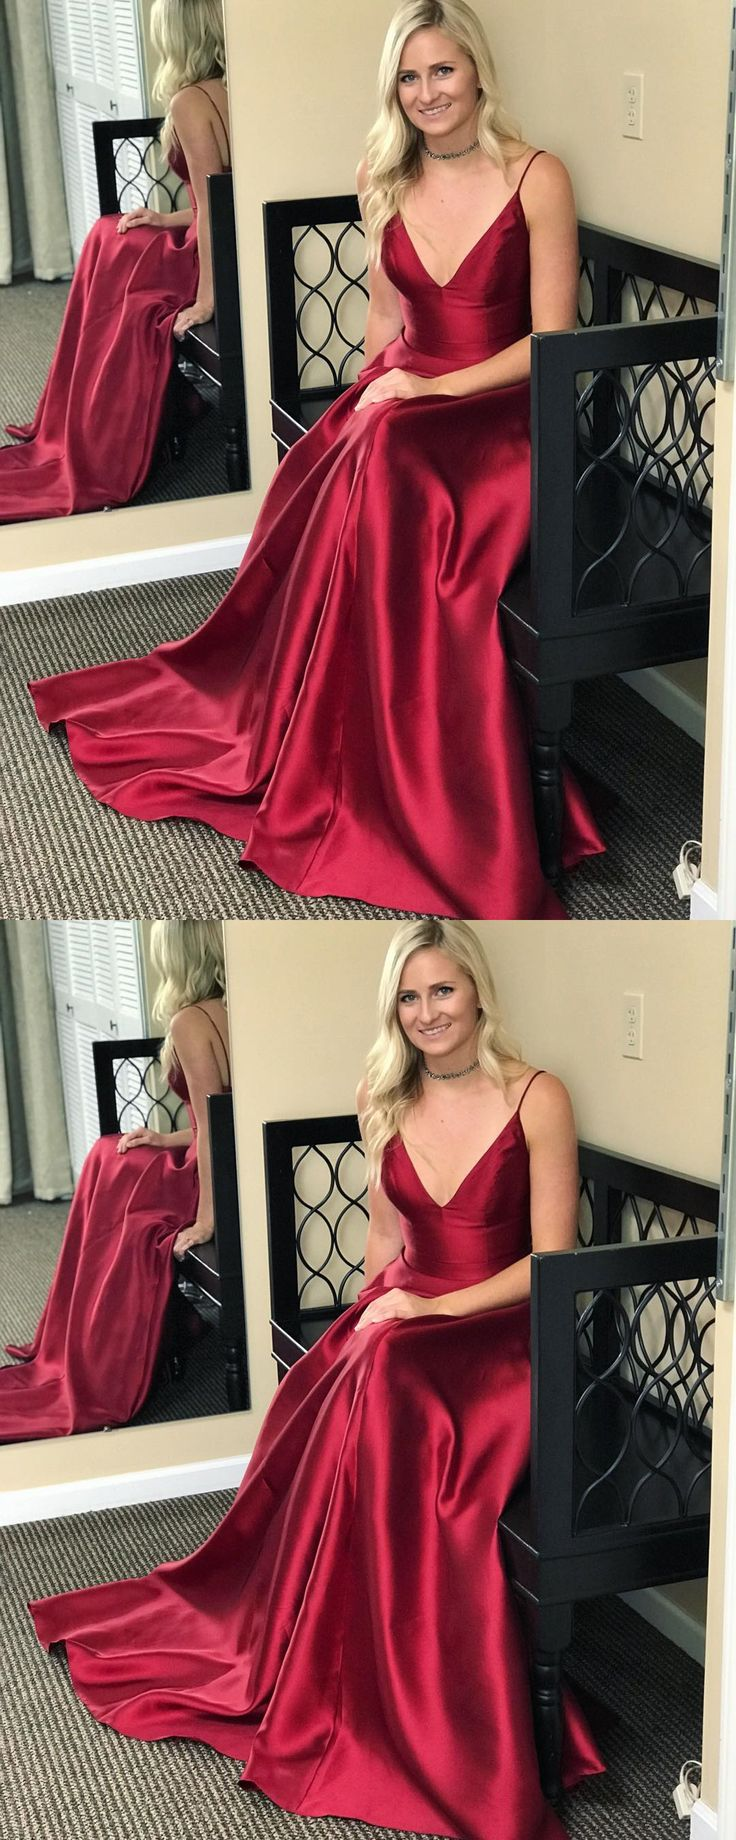 best dresses images on pinterest ball dresses ball gown